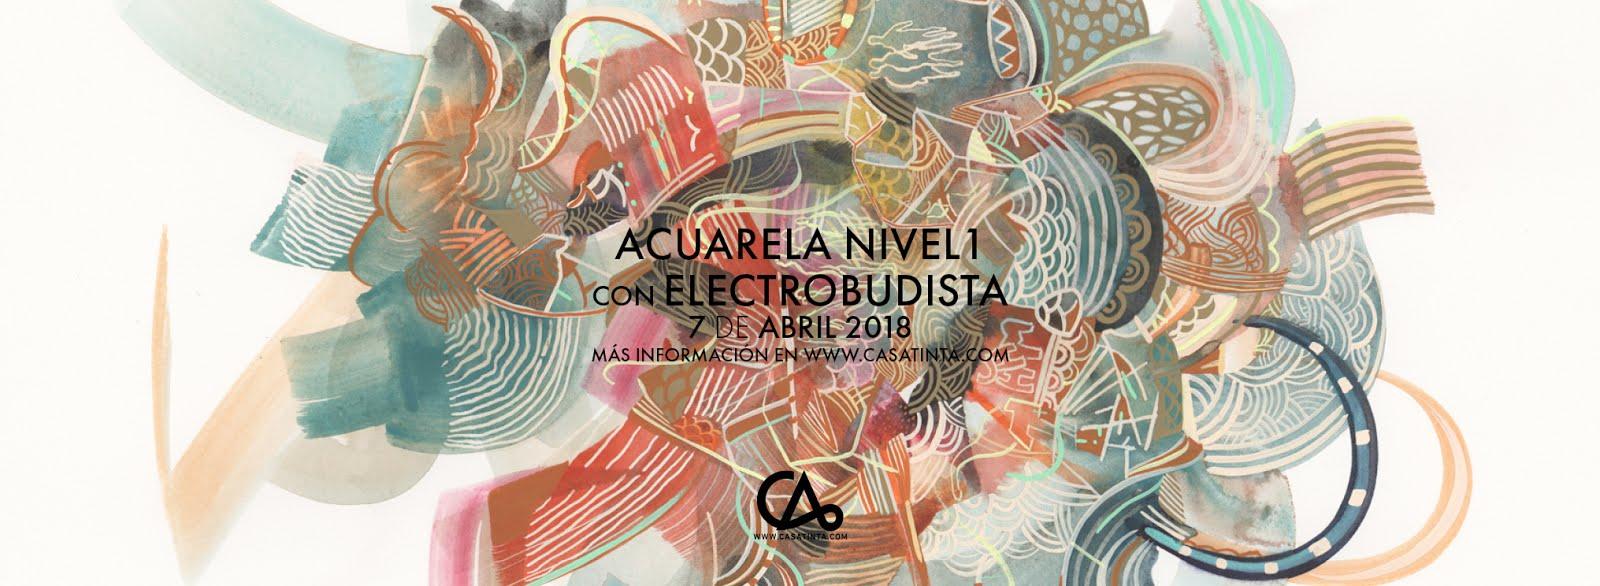 ACUARELA nivel 1 con Electrobudista // 7 de abril